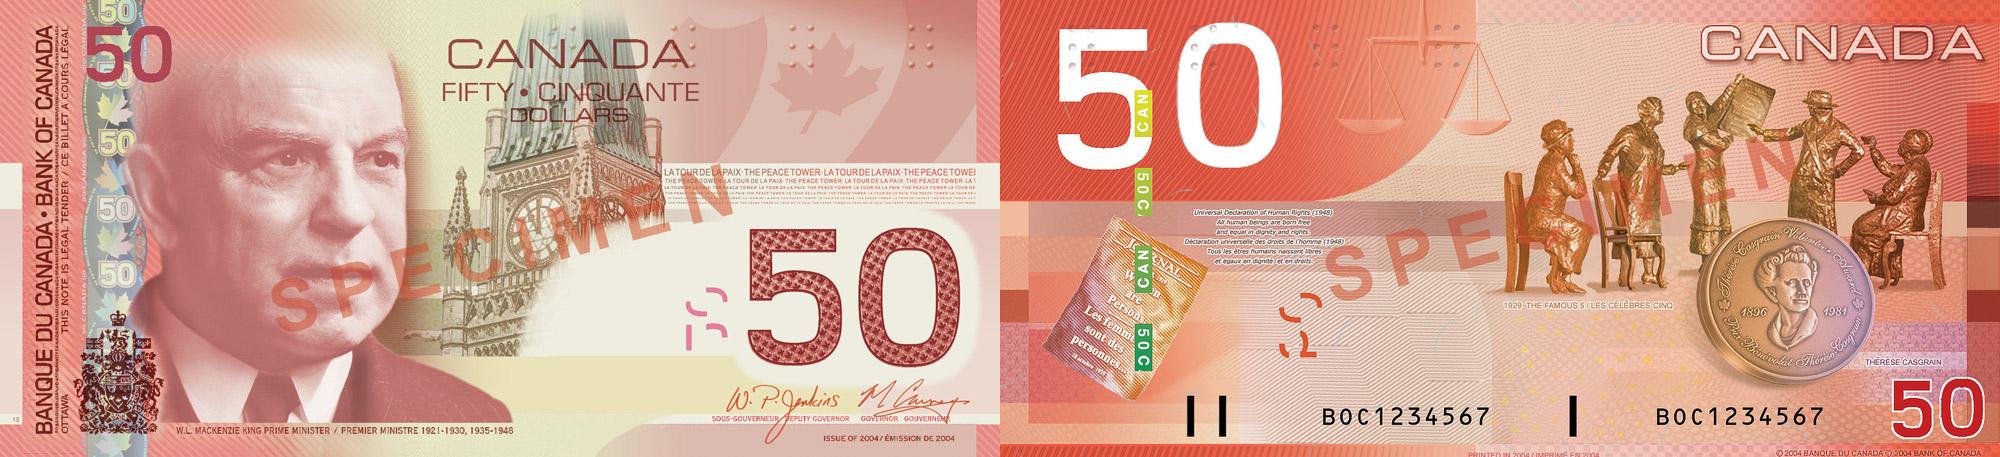 50 dollars 2004-2006 - Canada Banknote